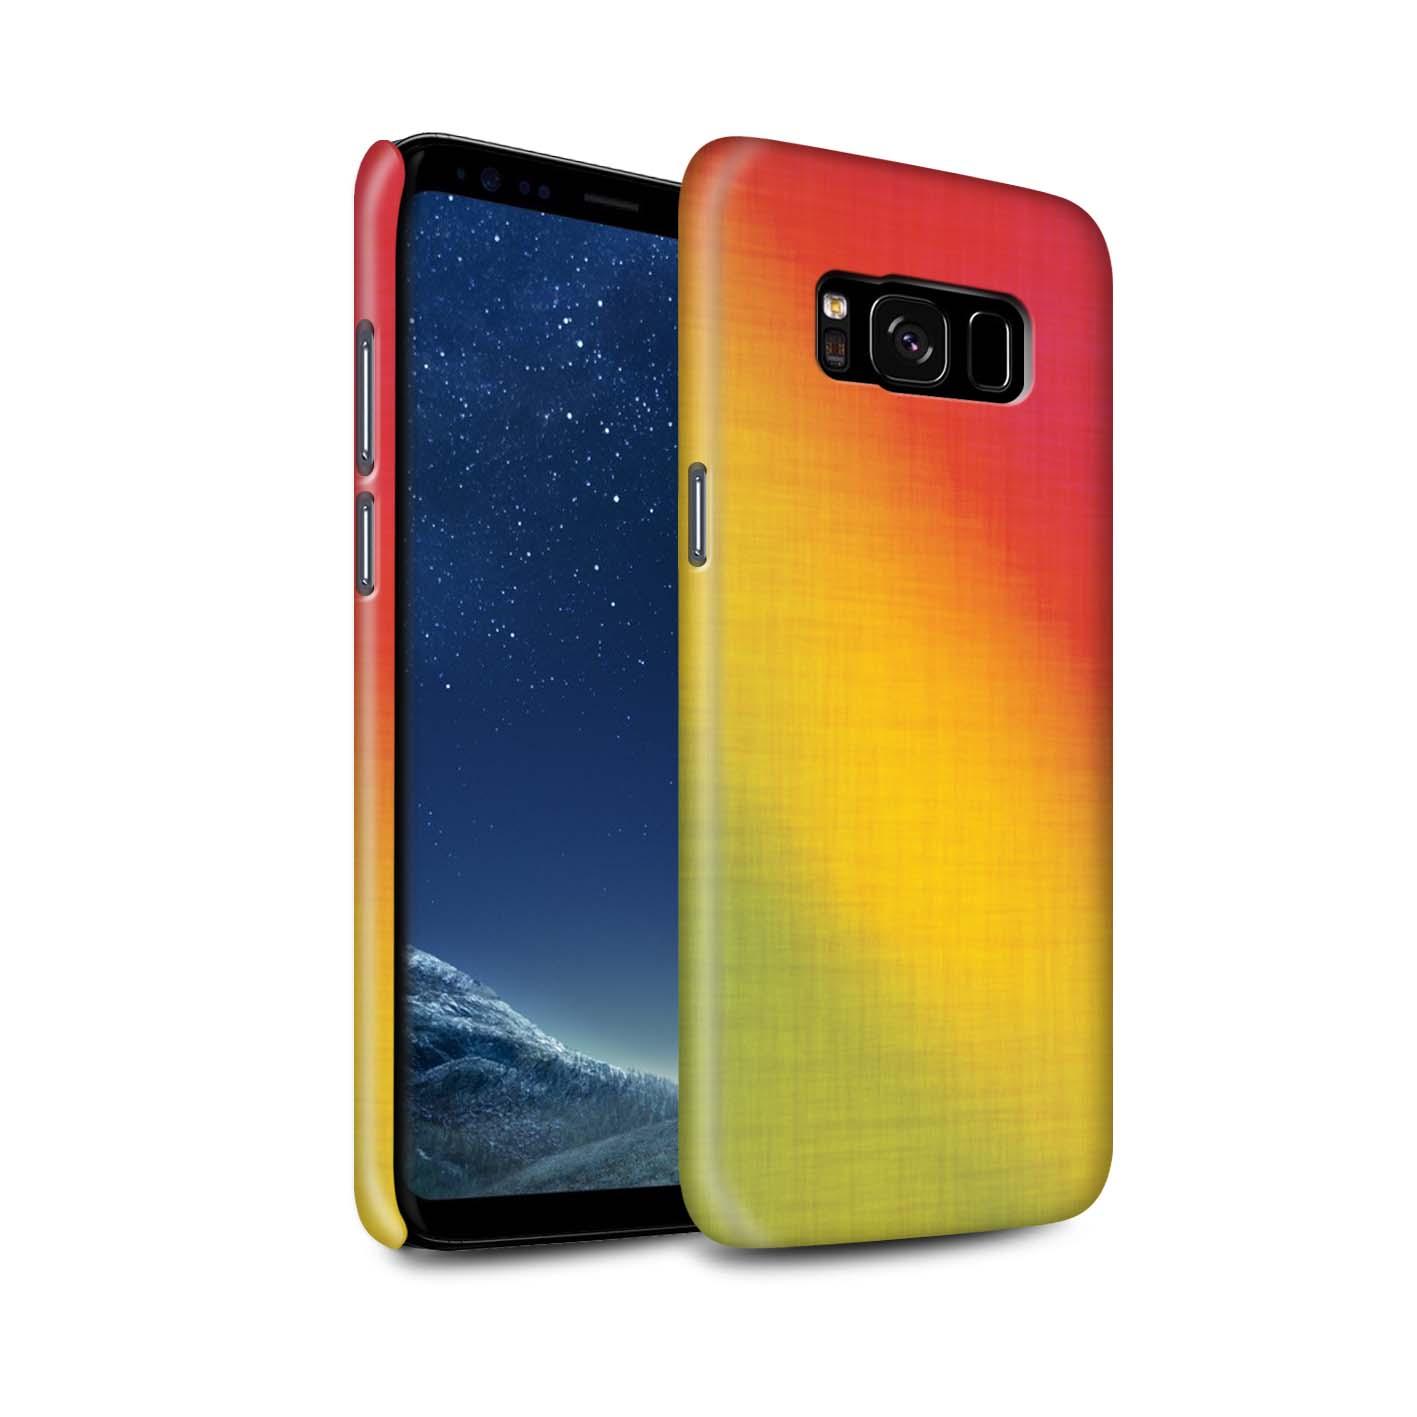 Coque-Etui-Brillant-de-STUFF4-pour-Samsung-Galaxy-S8-G950-Ombre-Mode